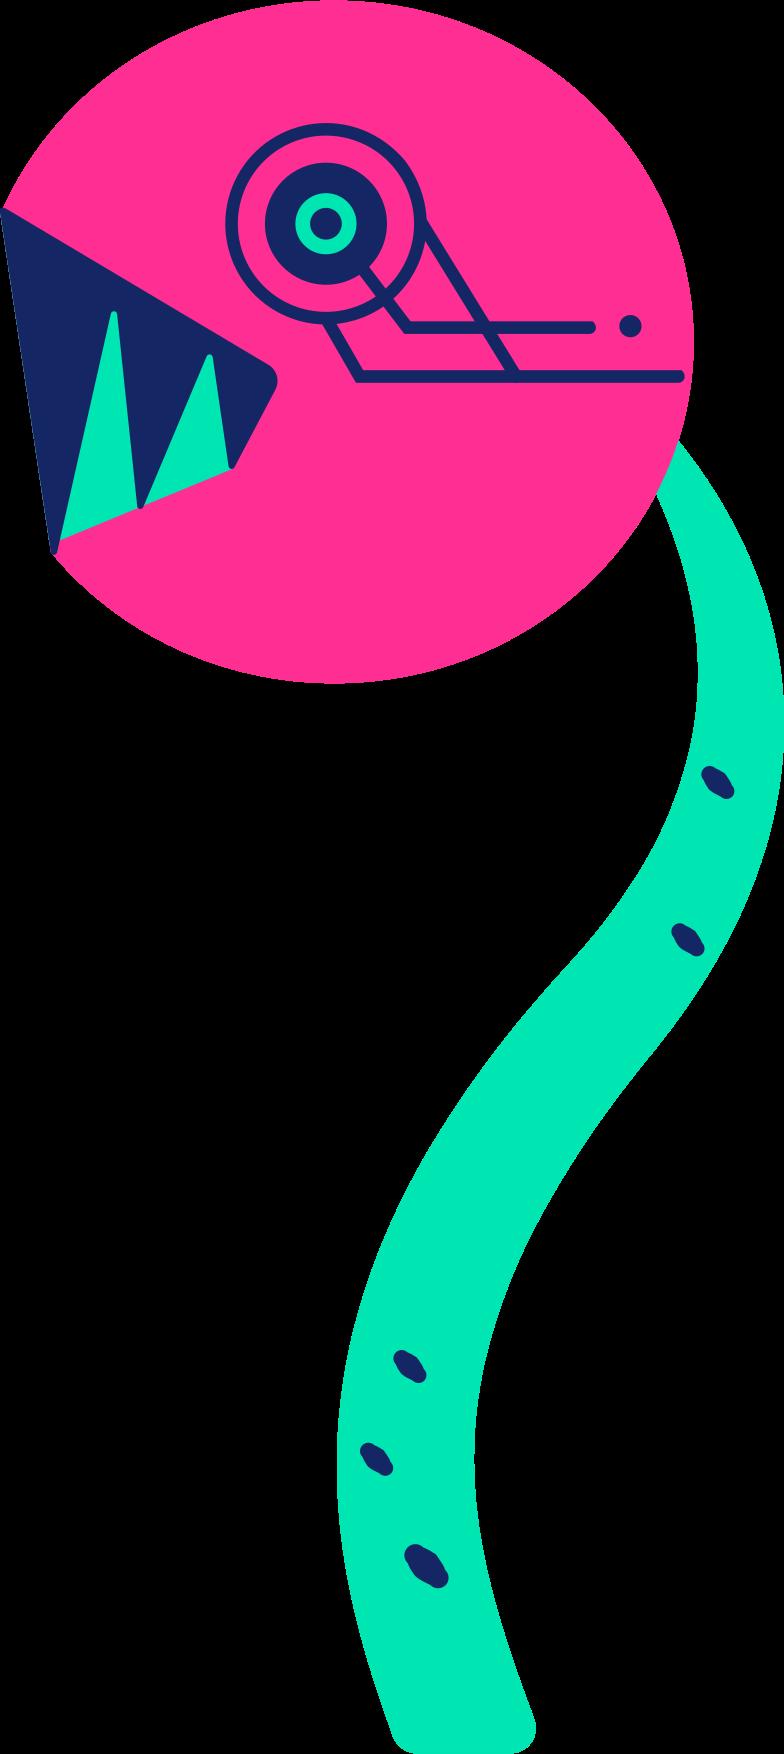 an evil plant Clipart illustration in PNG, SVG